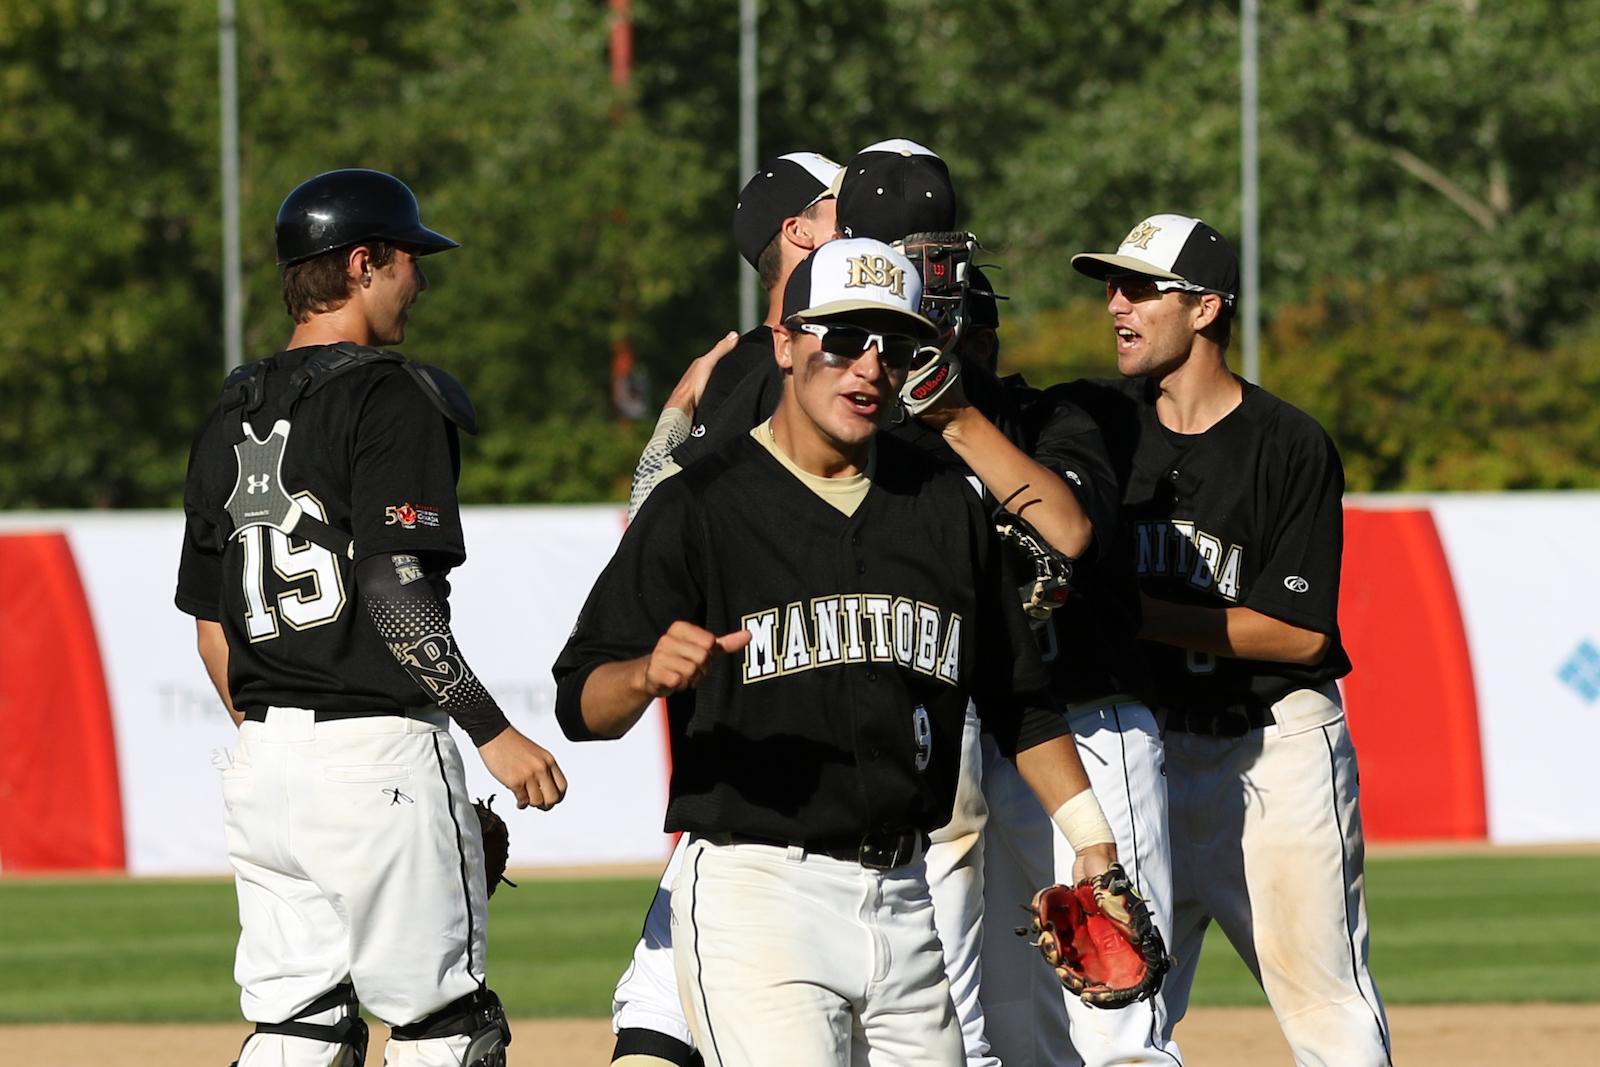 Canada Games Baseball: Manitoba to play Saskatchewan for gold